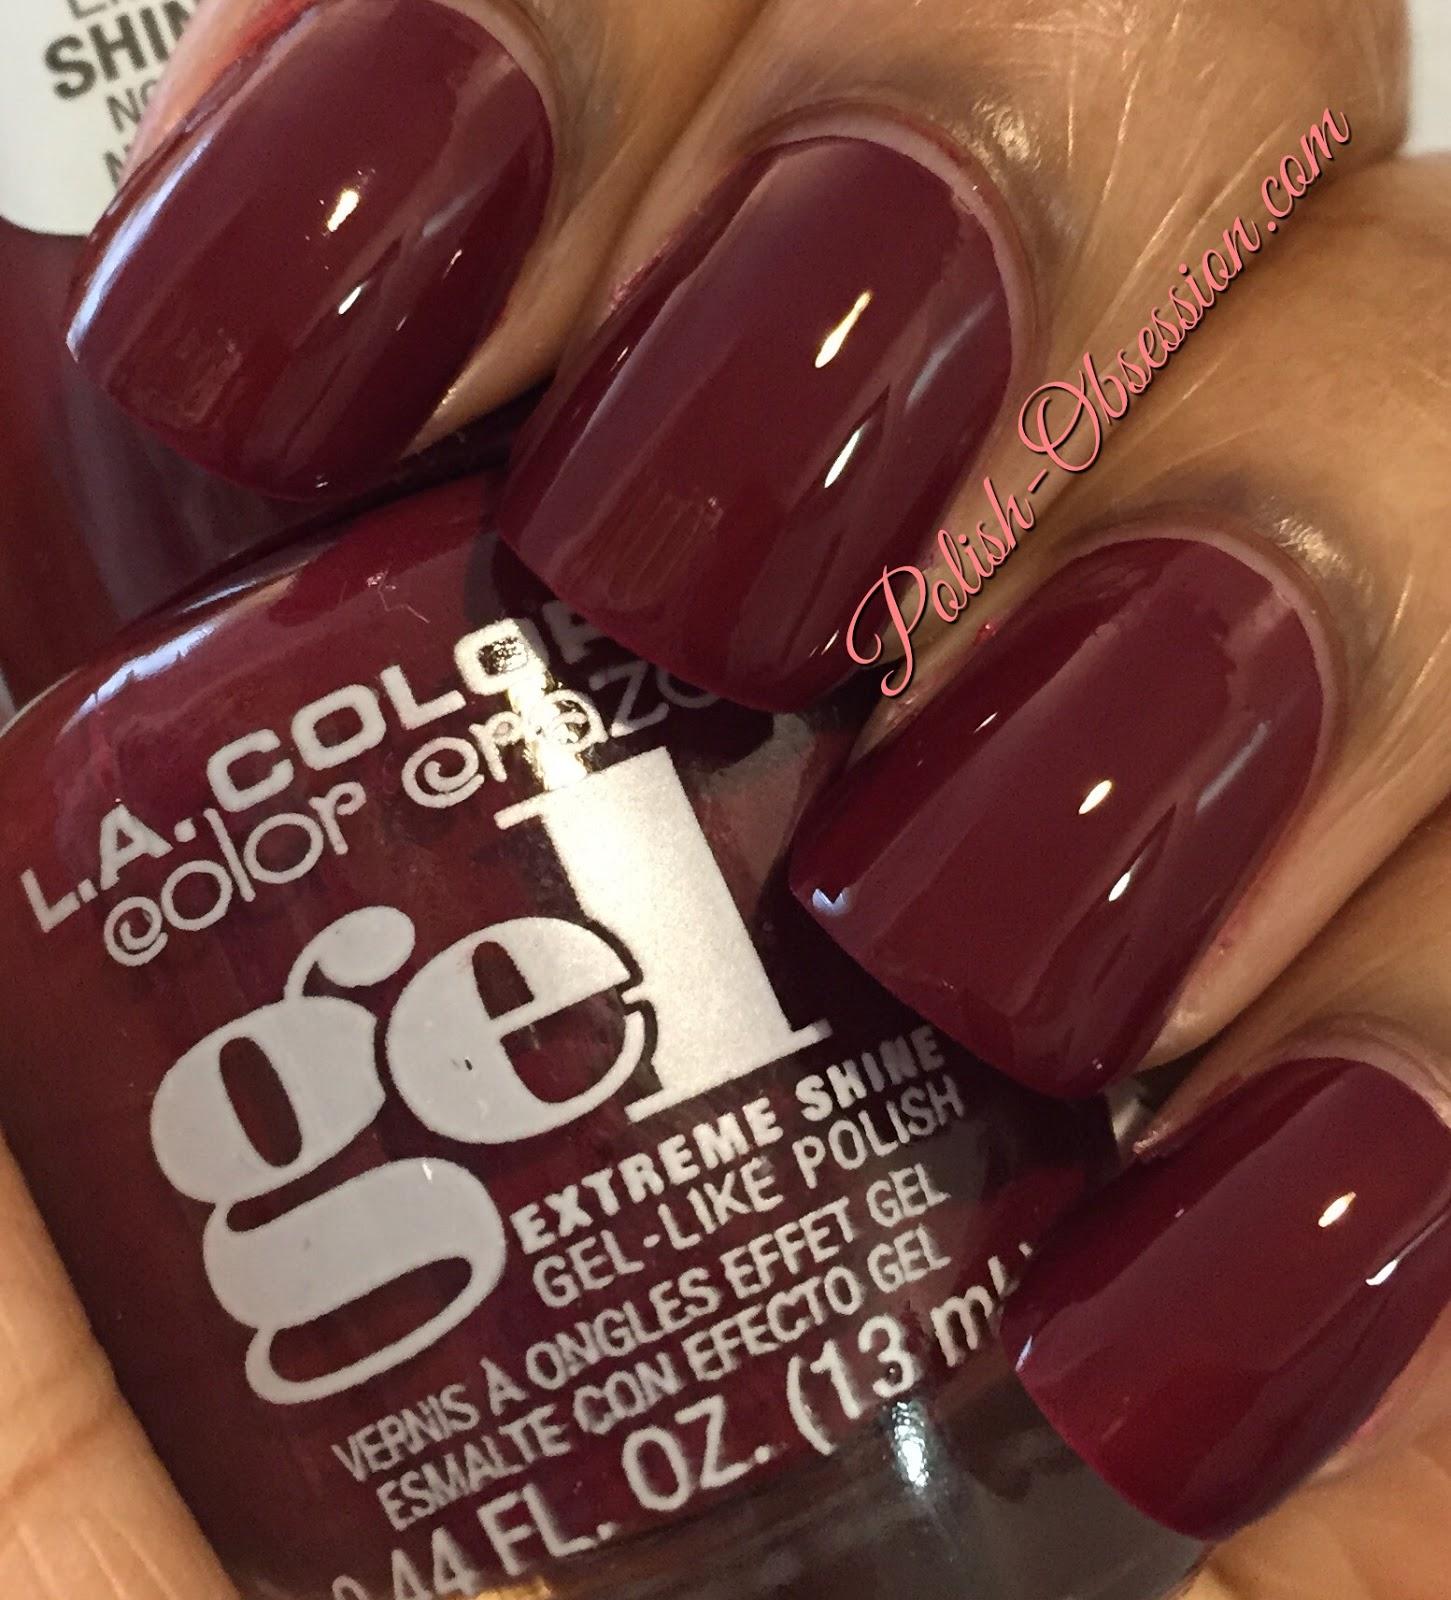 La Girl Gel Nail Polish Review | Hession Hairdressing